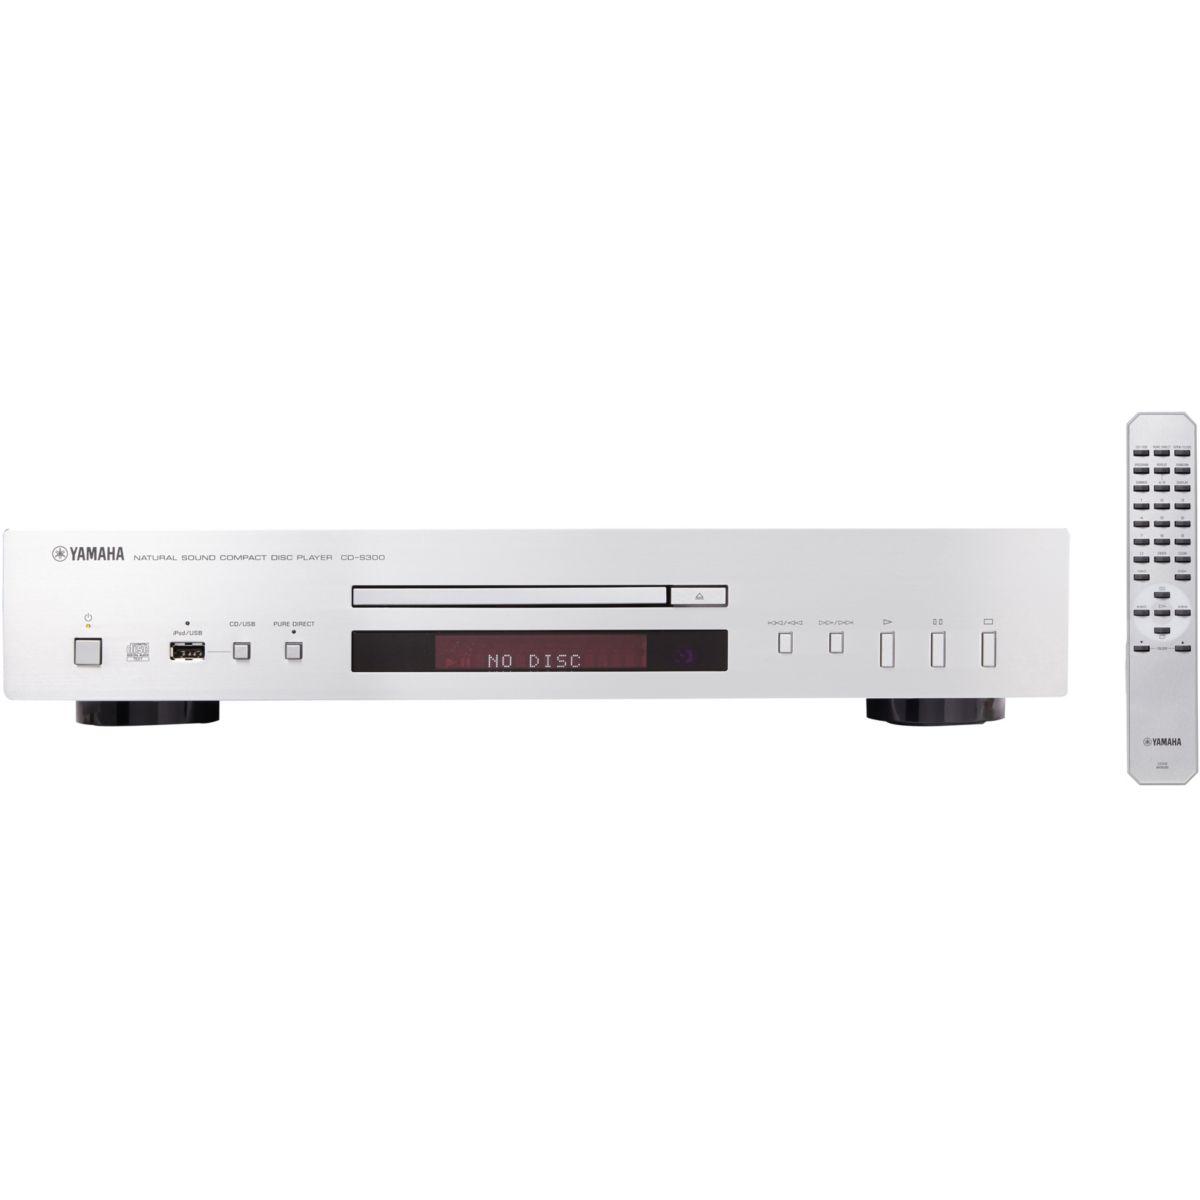 Pack promo Platine CD YAMAHA CD-S300 Silver + Amplificateur Hi-Fi DENON PMA520 Silver